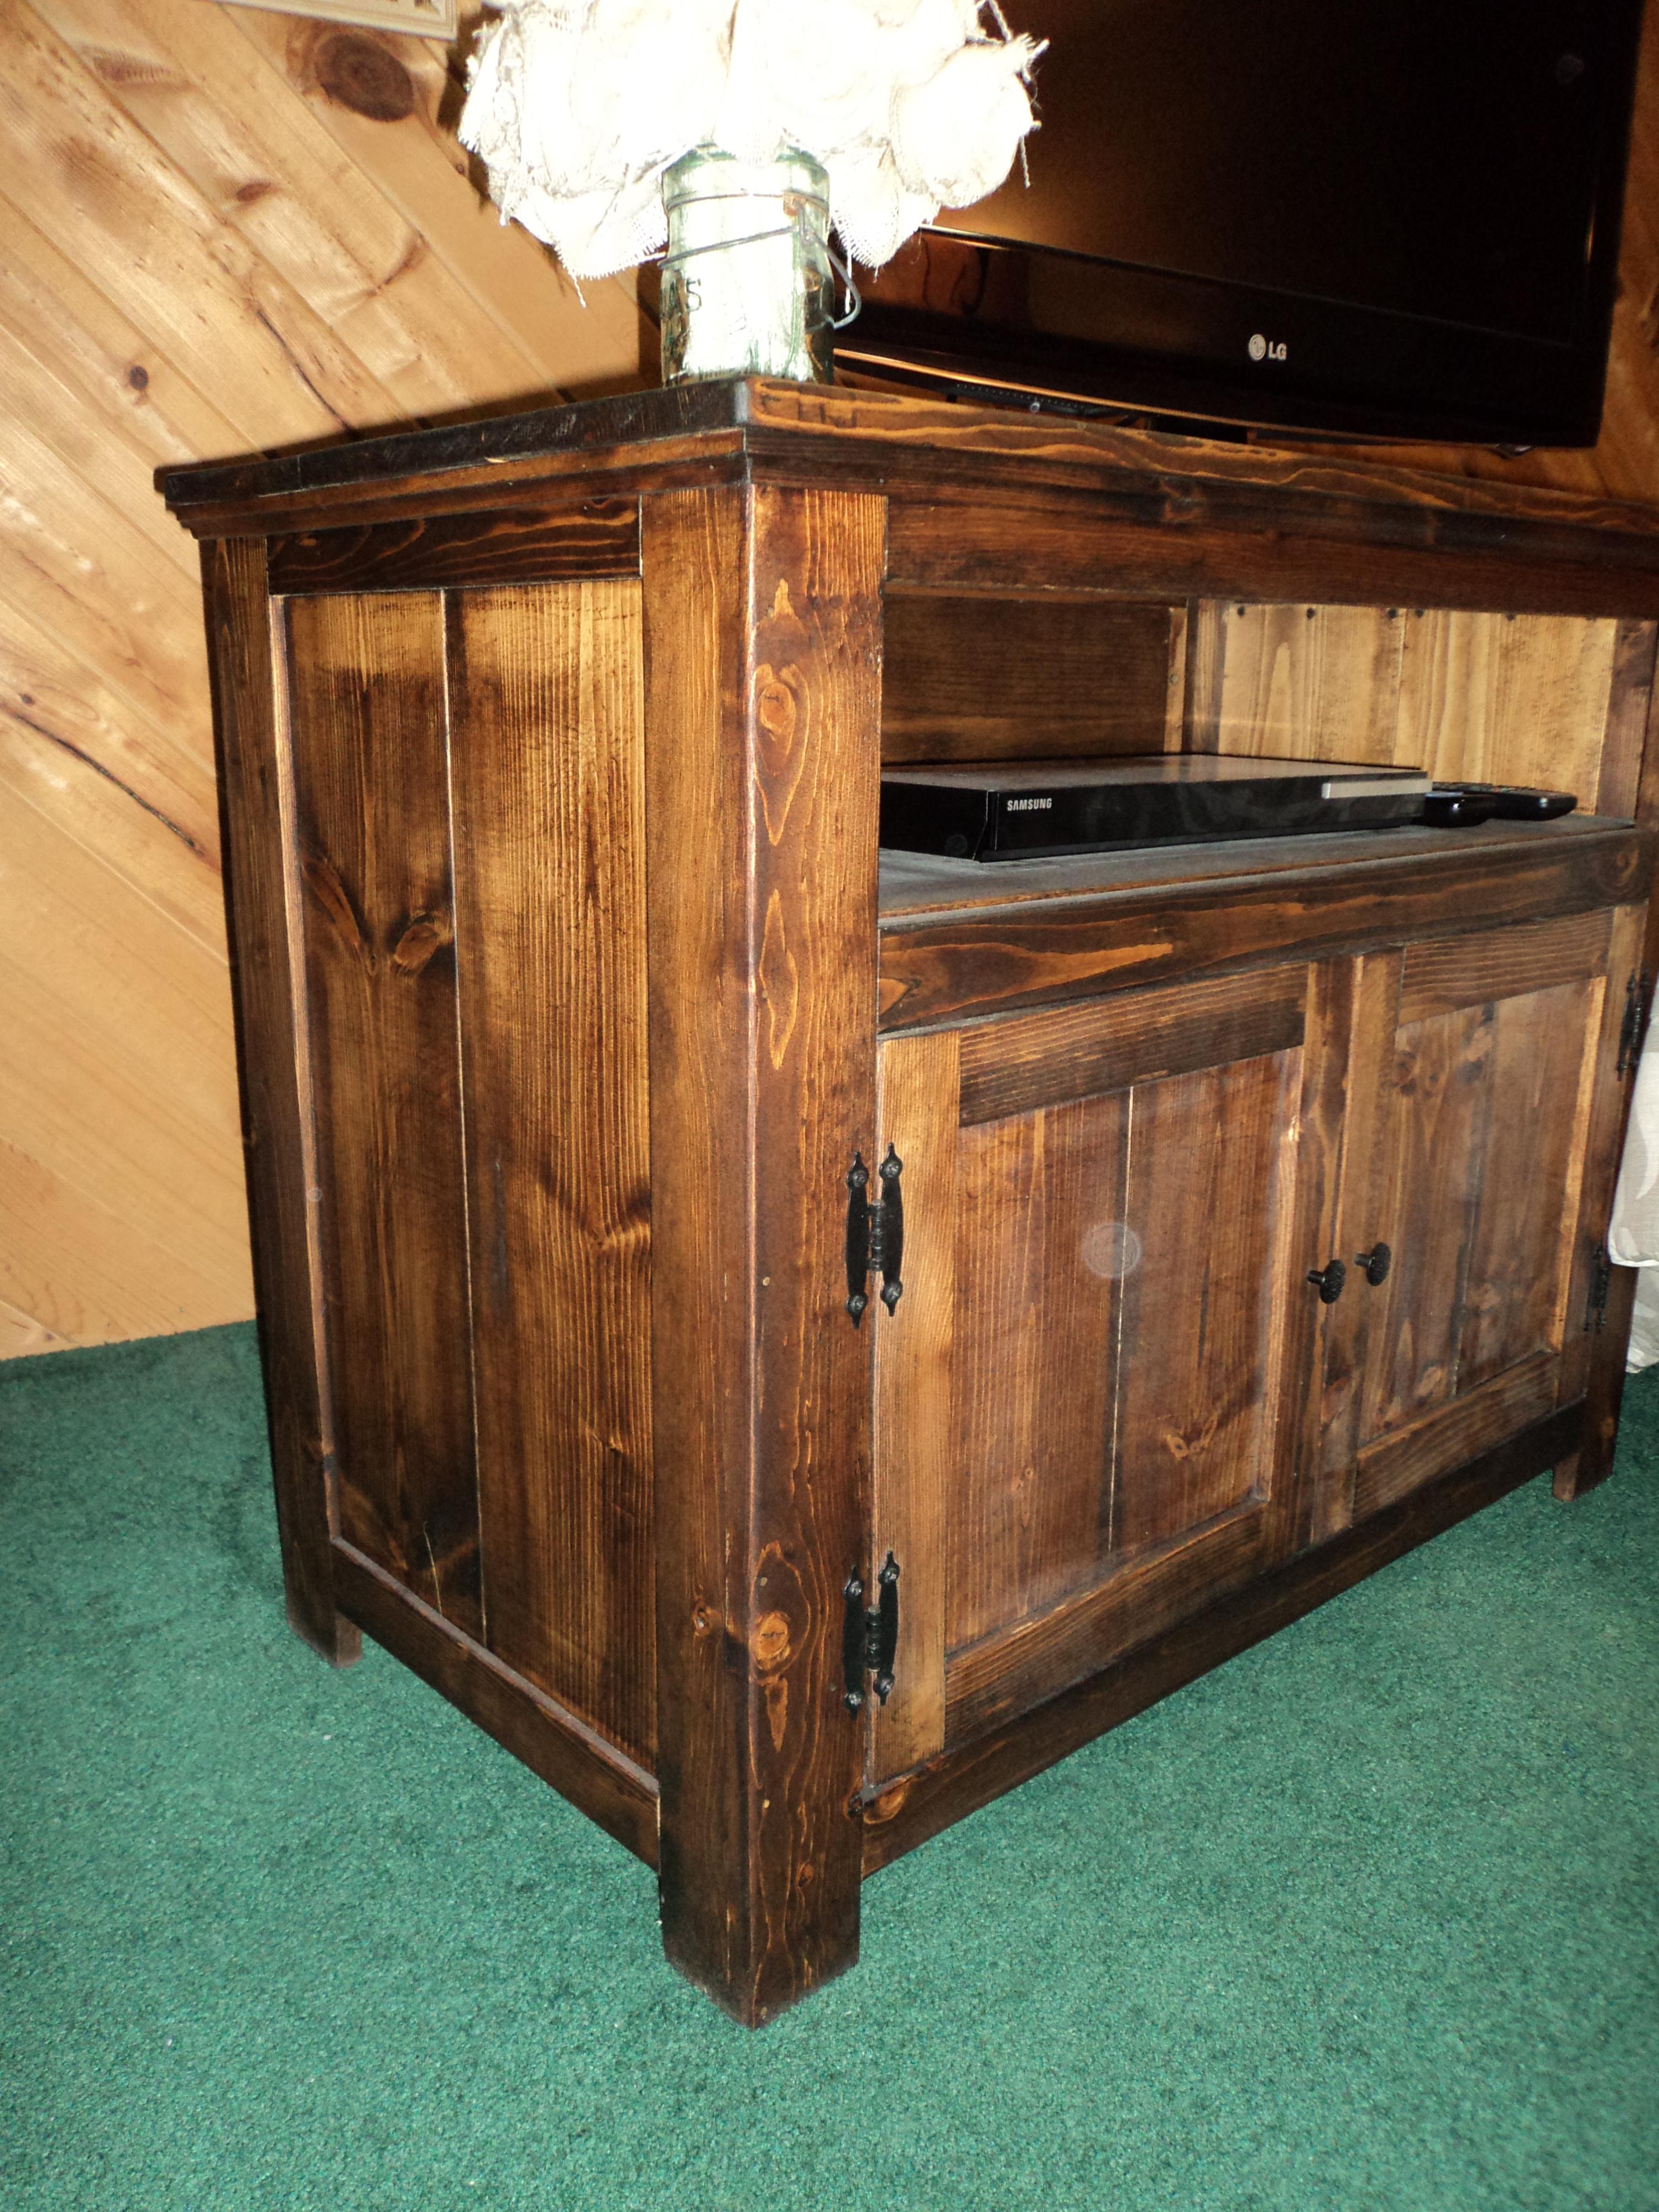 Outdoor Log Furniture Plans Diy Woodworking